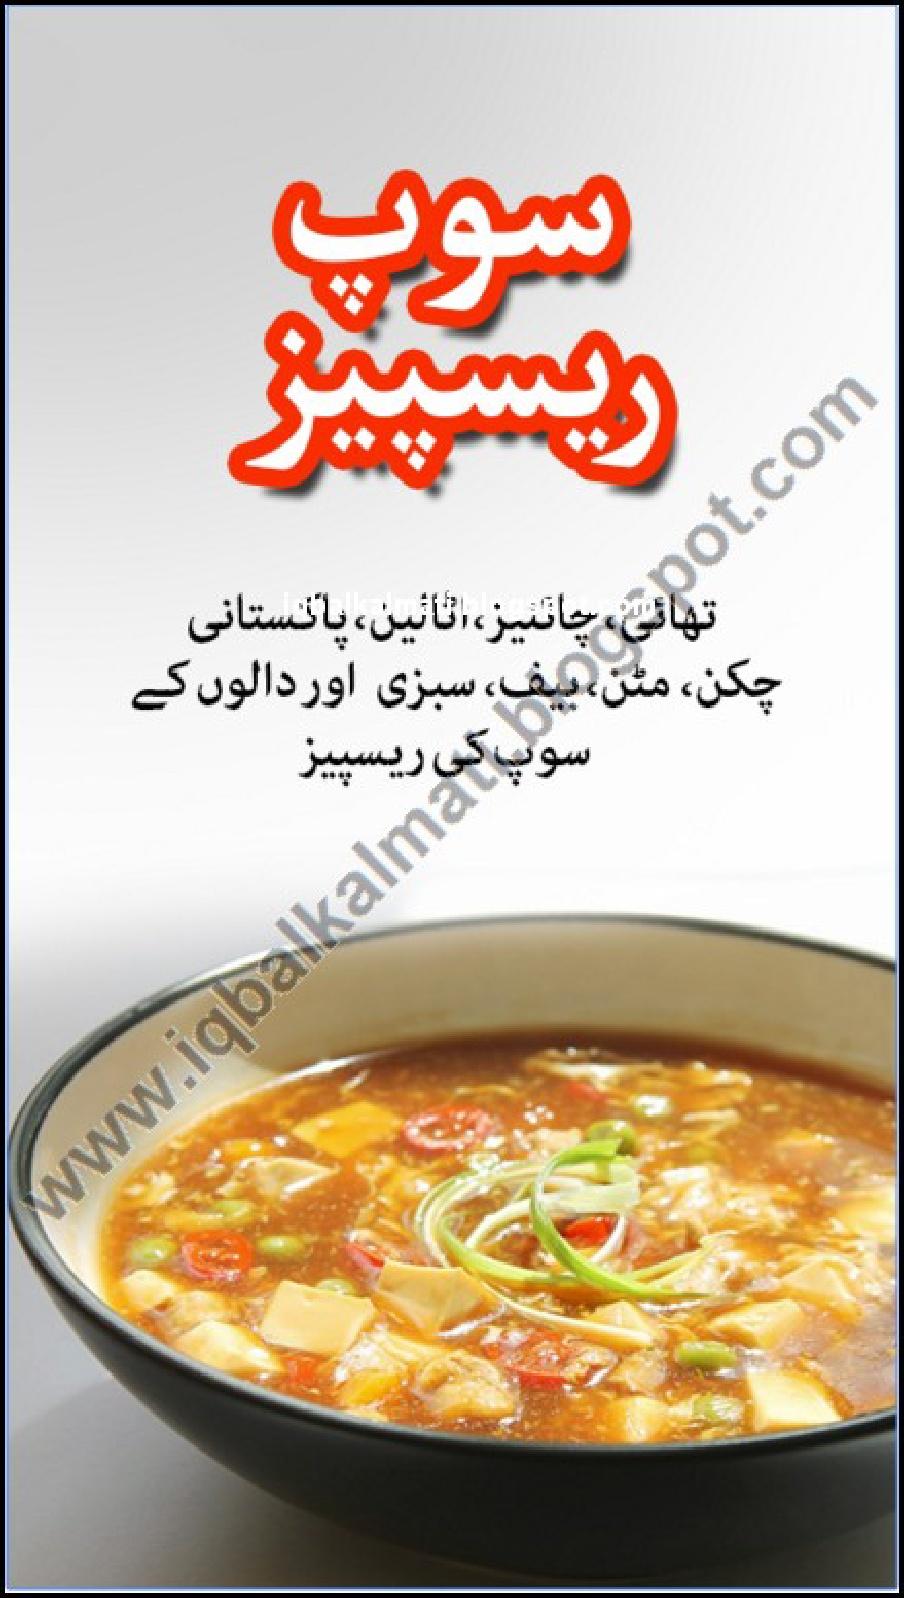 Soup Recipe Cooking Book in Urdu by pdfbookspk